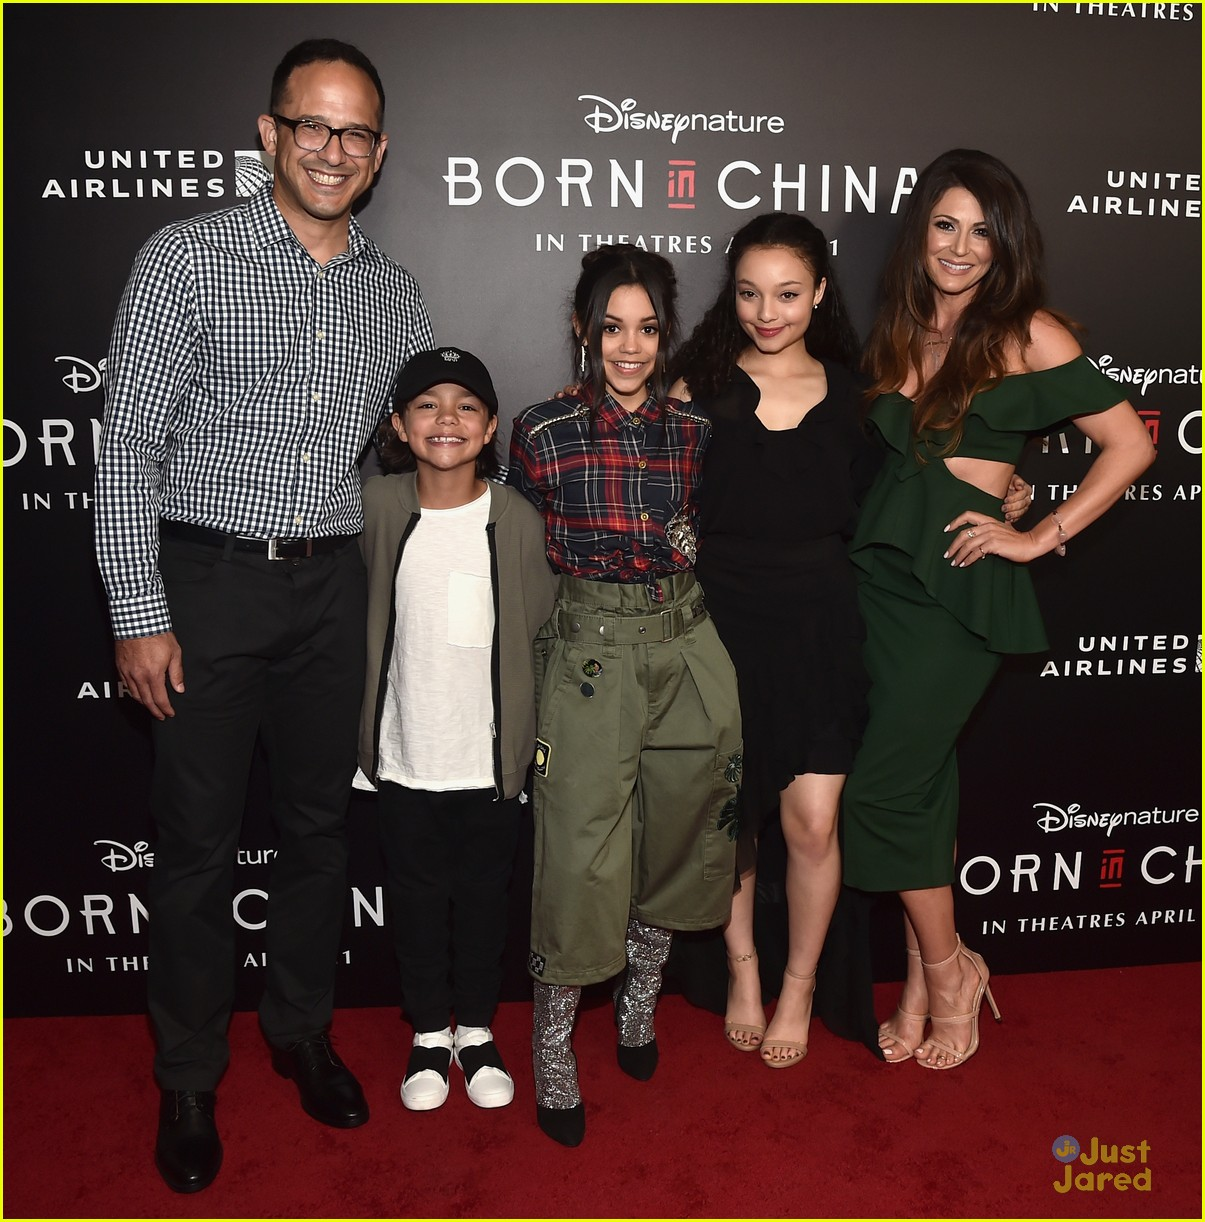 born in china premiere andi mack sitm mech casts attend 04